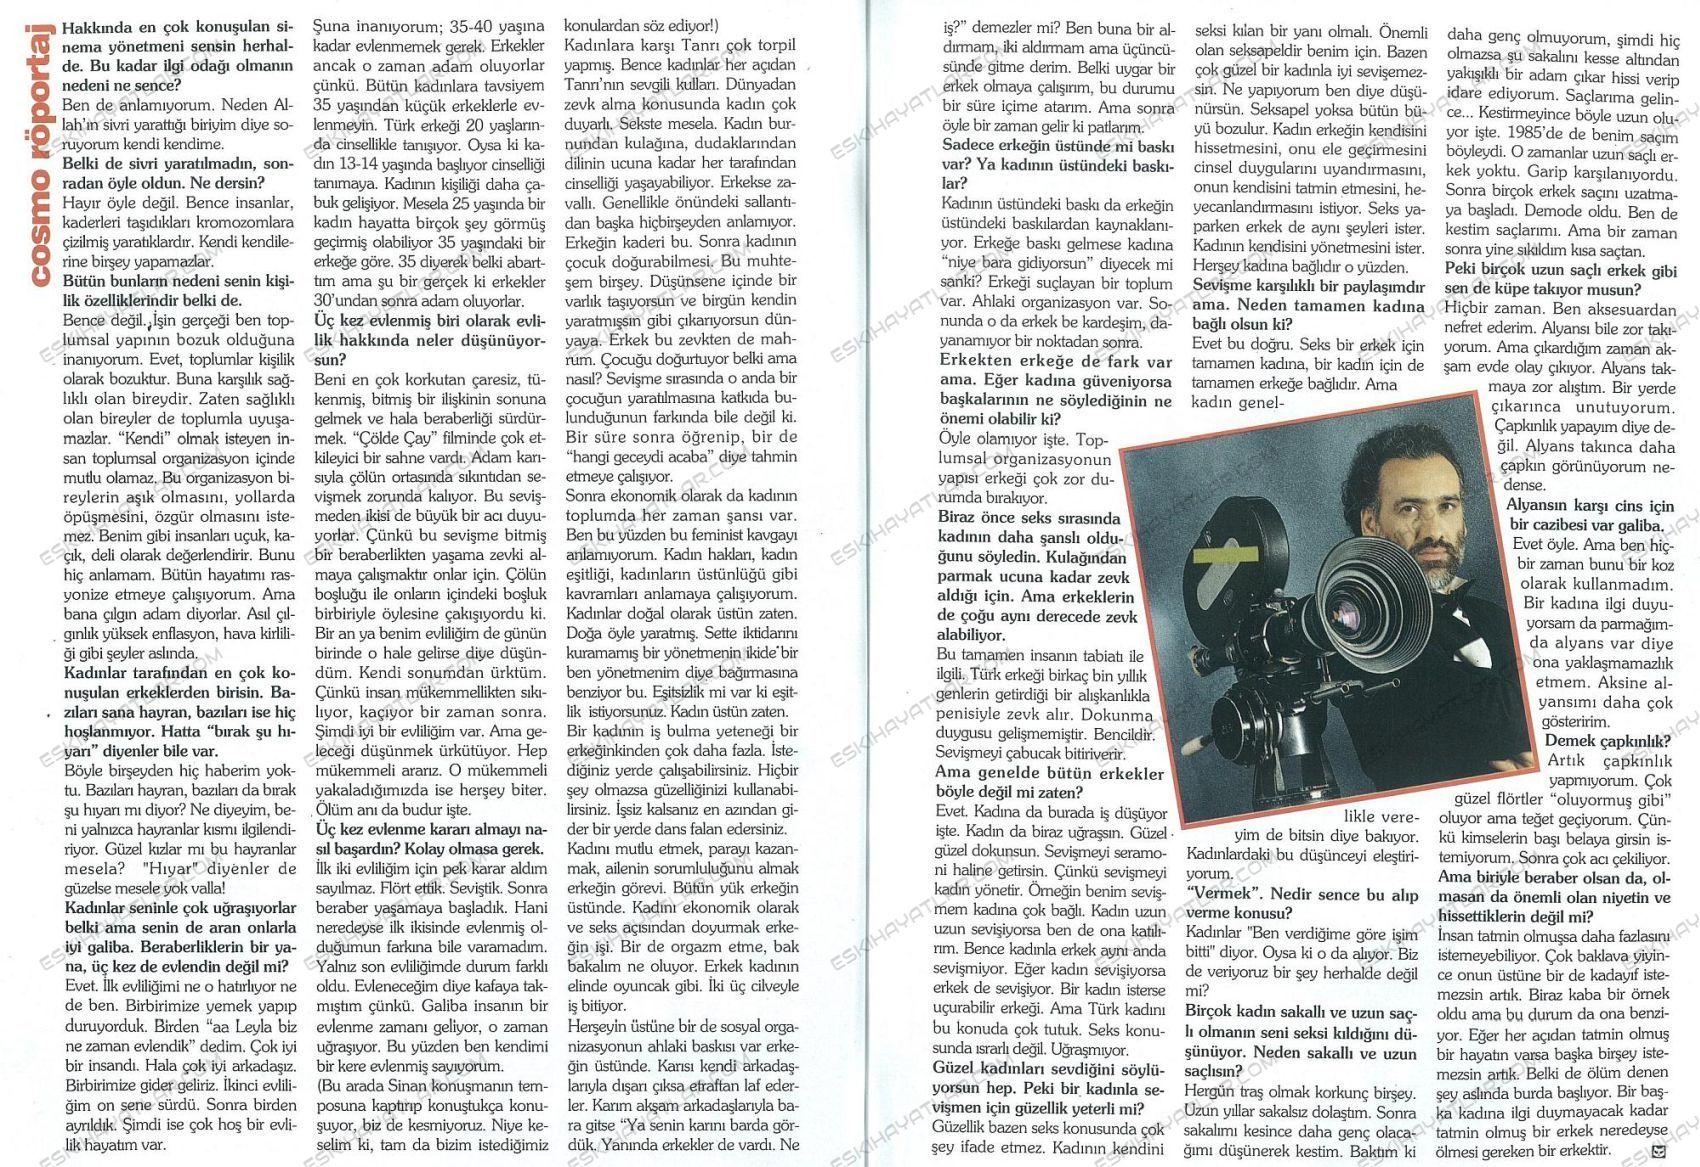 0151-cosmopolitan-1994-sinan-cetin-hulya-avsar-fotograflari (7)